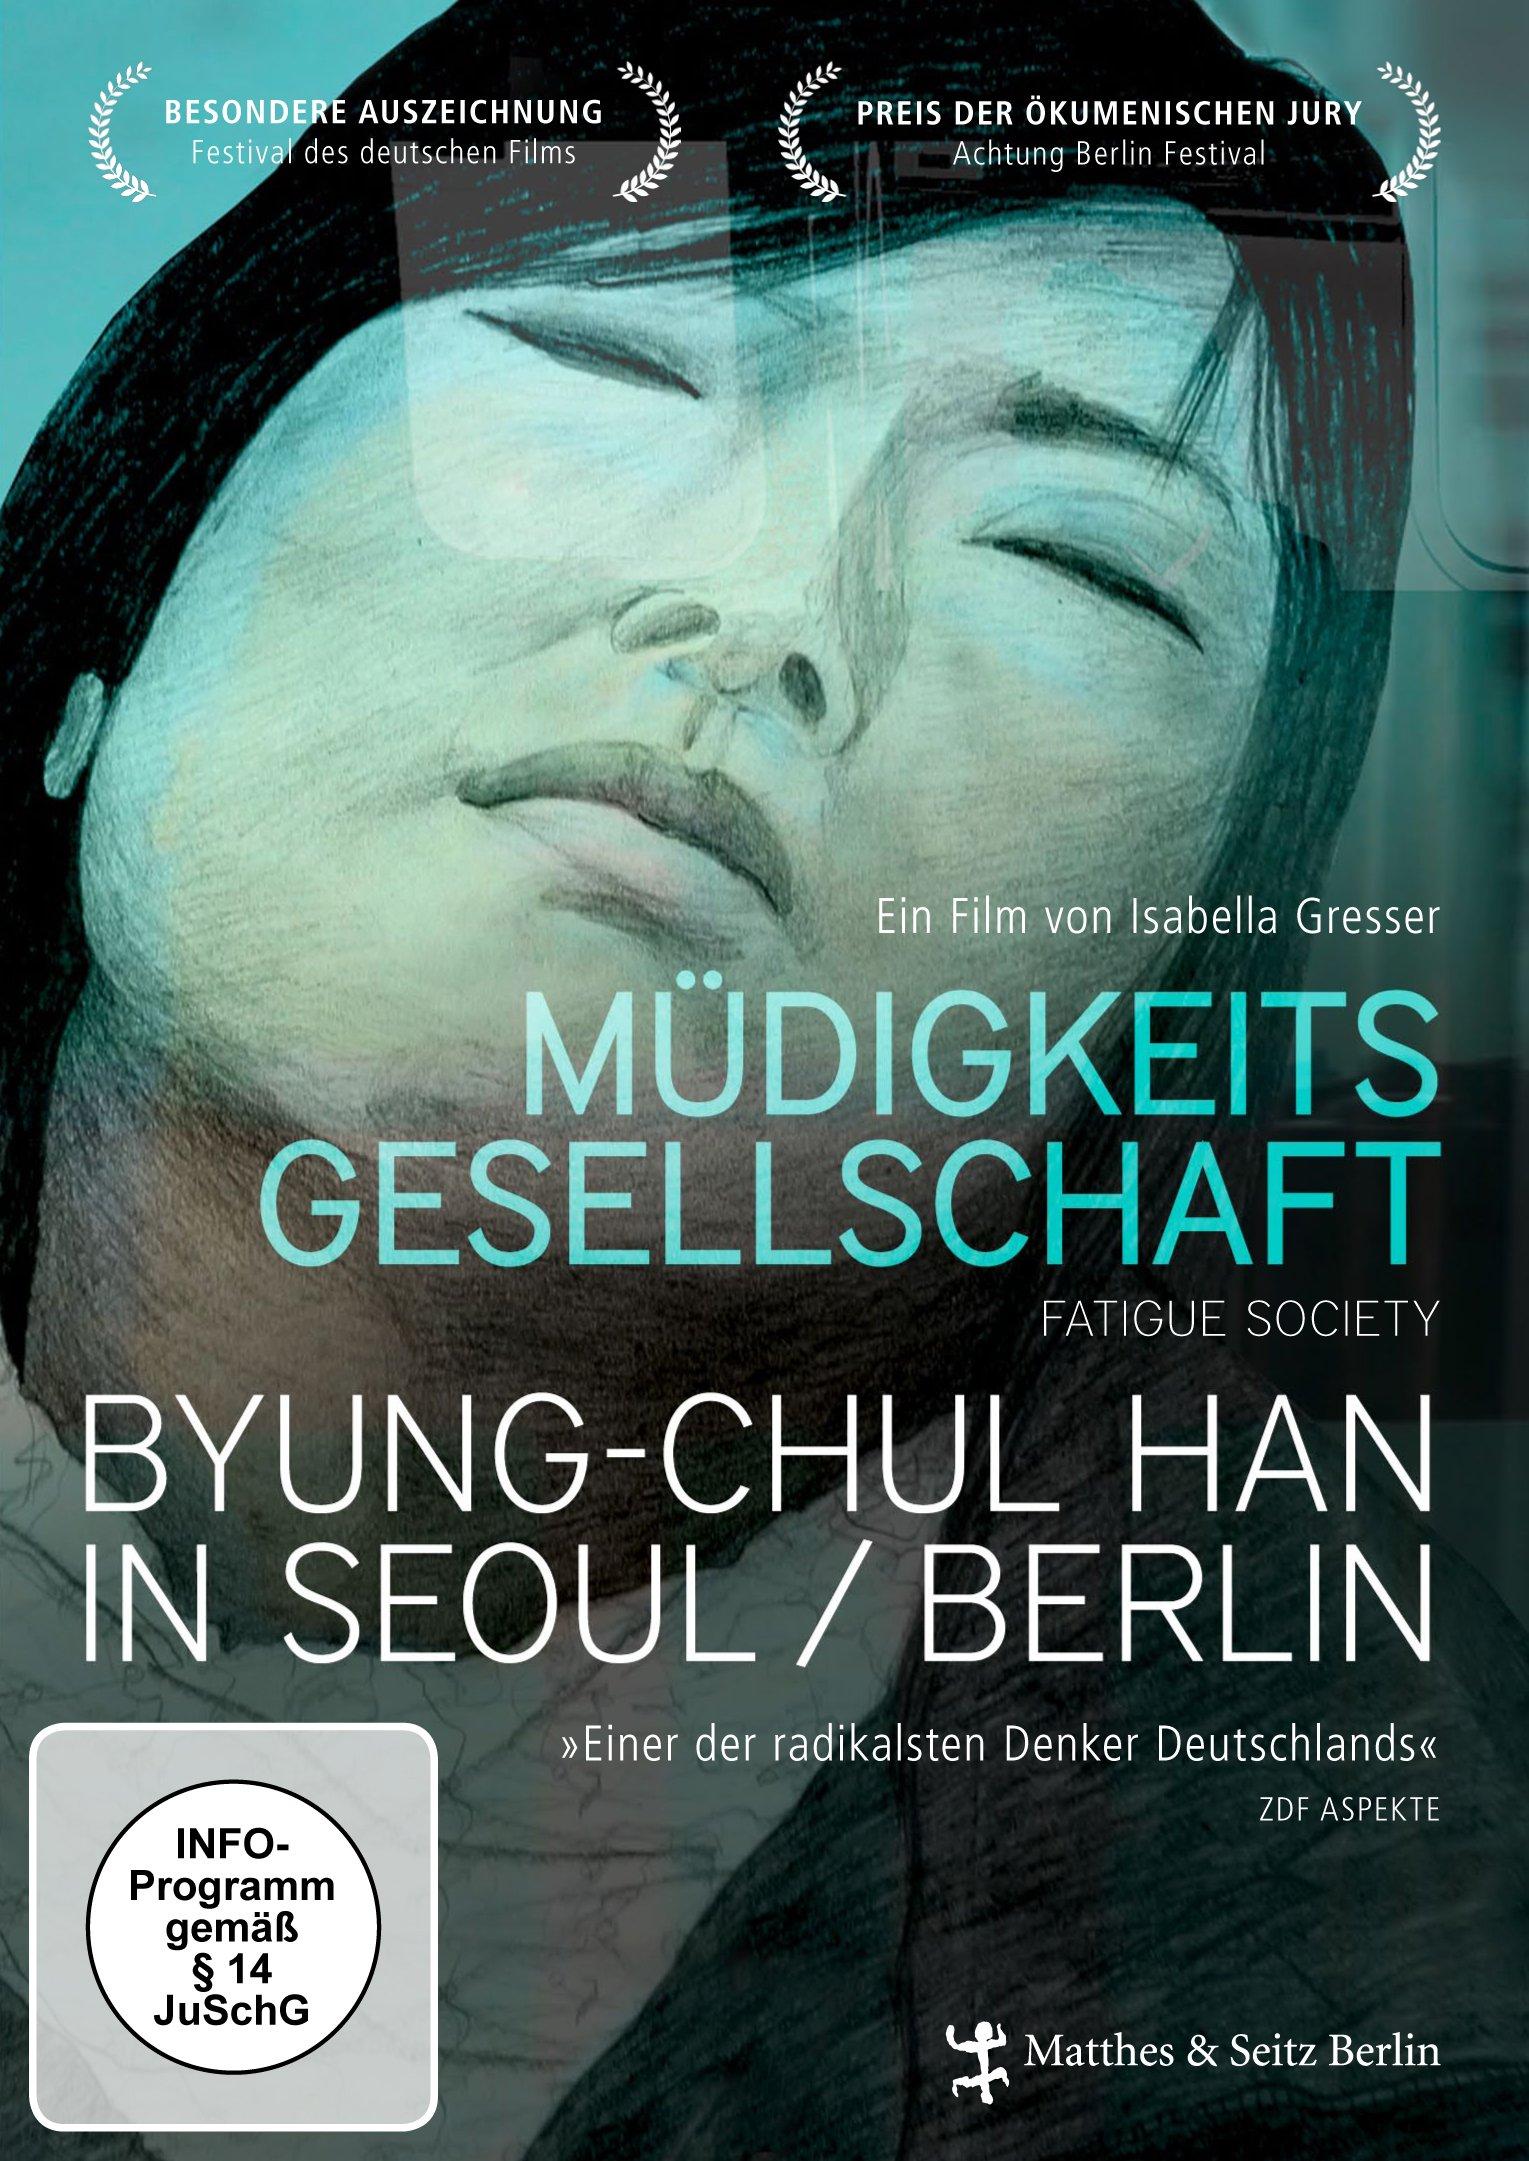 Müdigkeitsgesellschaft - Byung-Chul Han in Seoul/Berlin